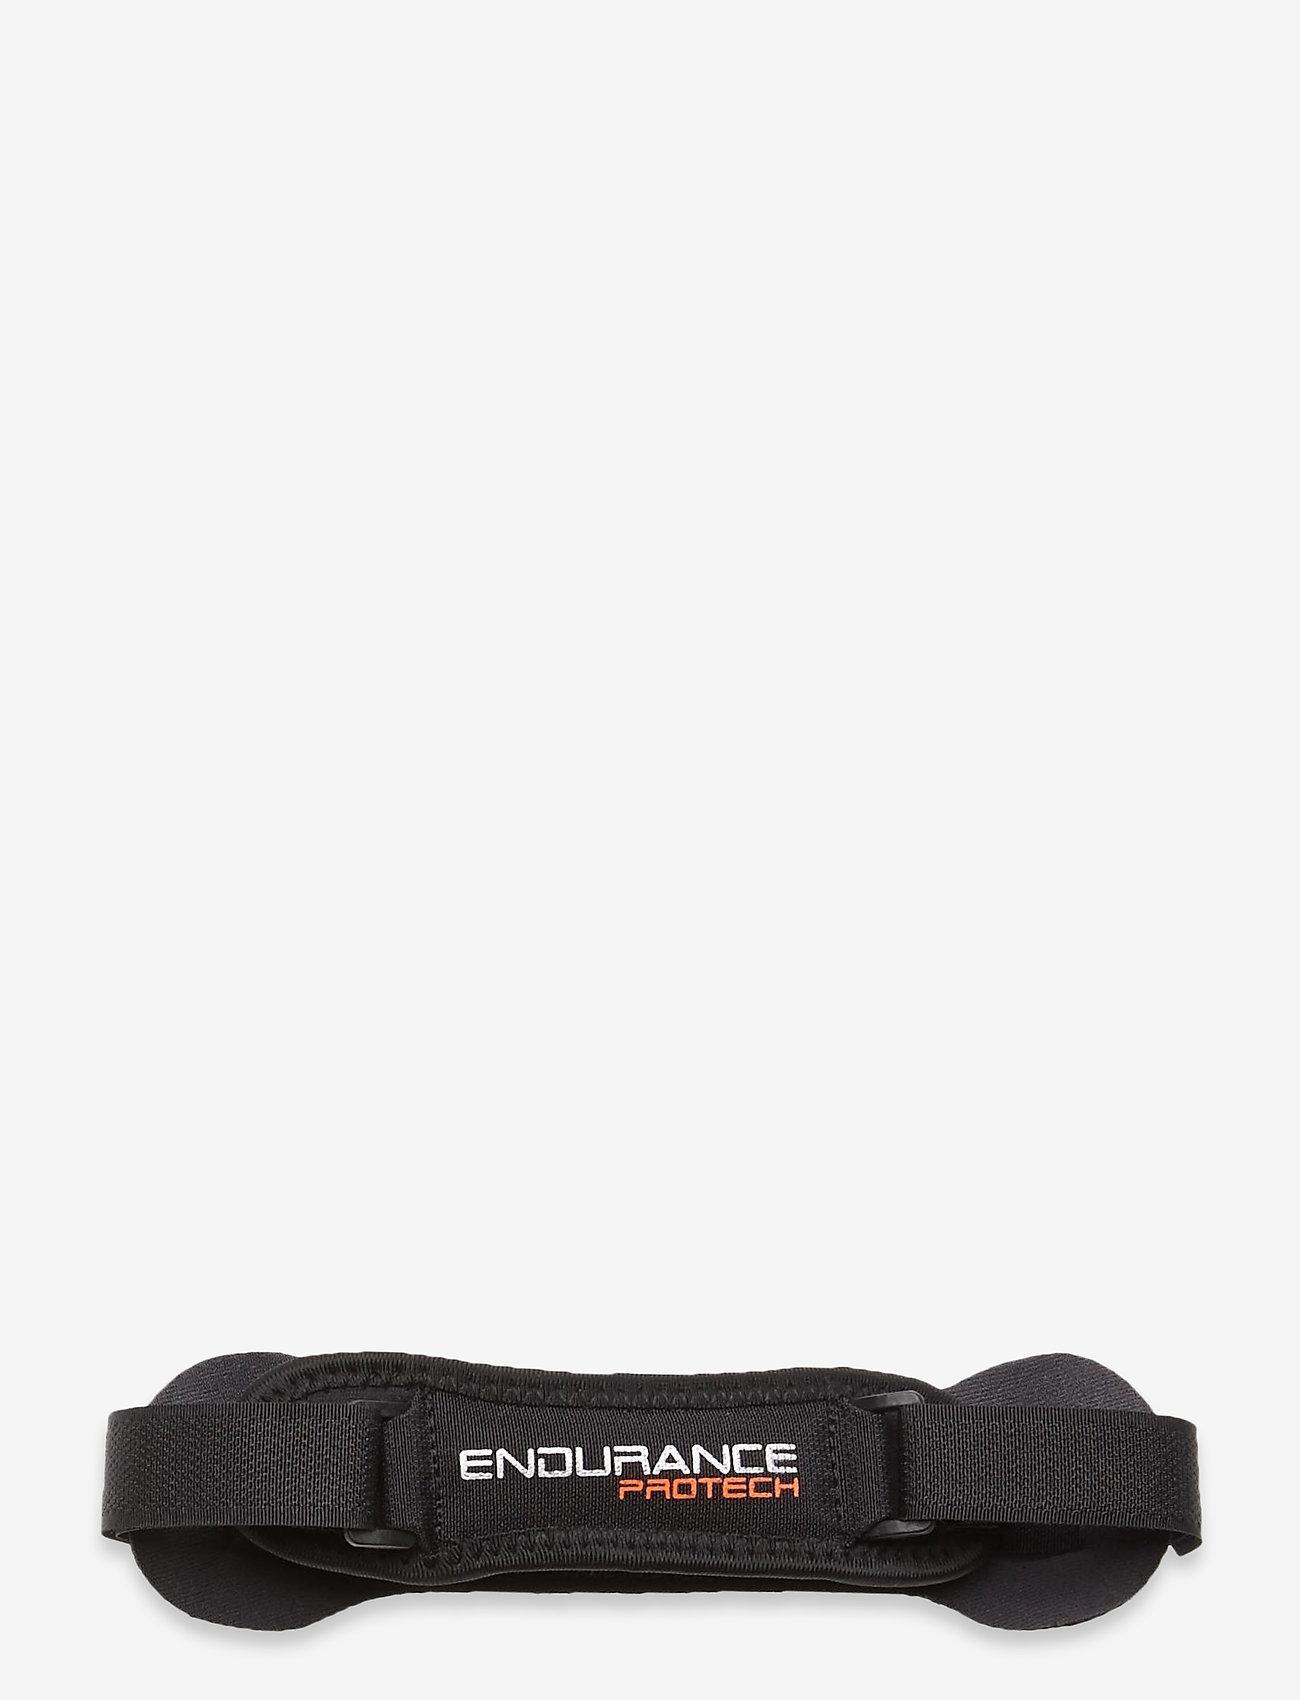 Endurance - PROTECH Knee Strap - knee support - 1001 black - 0